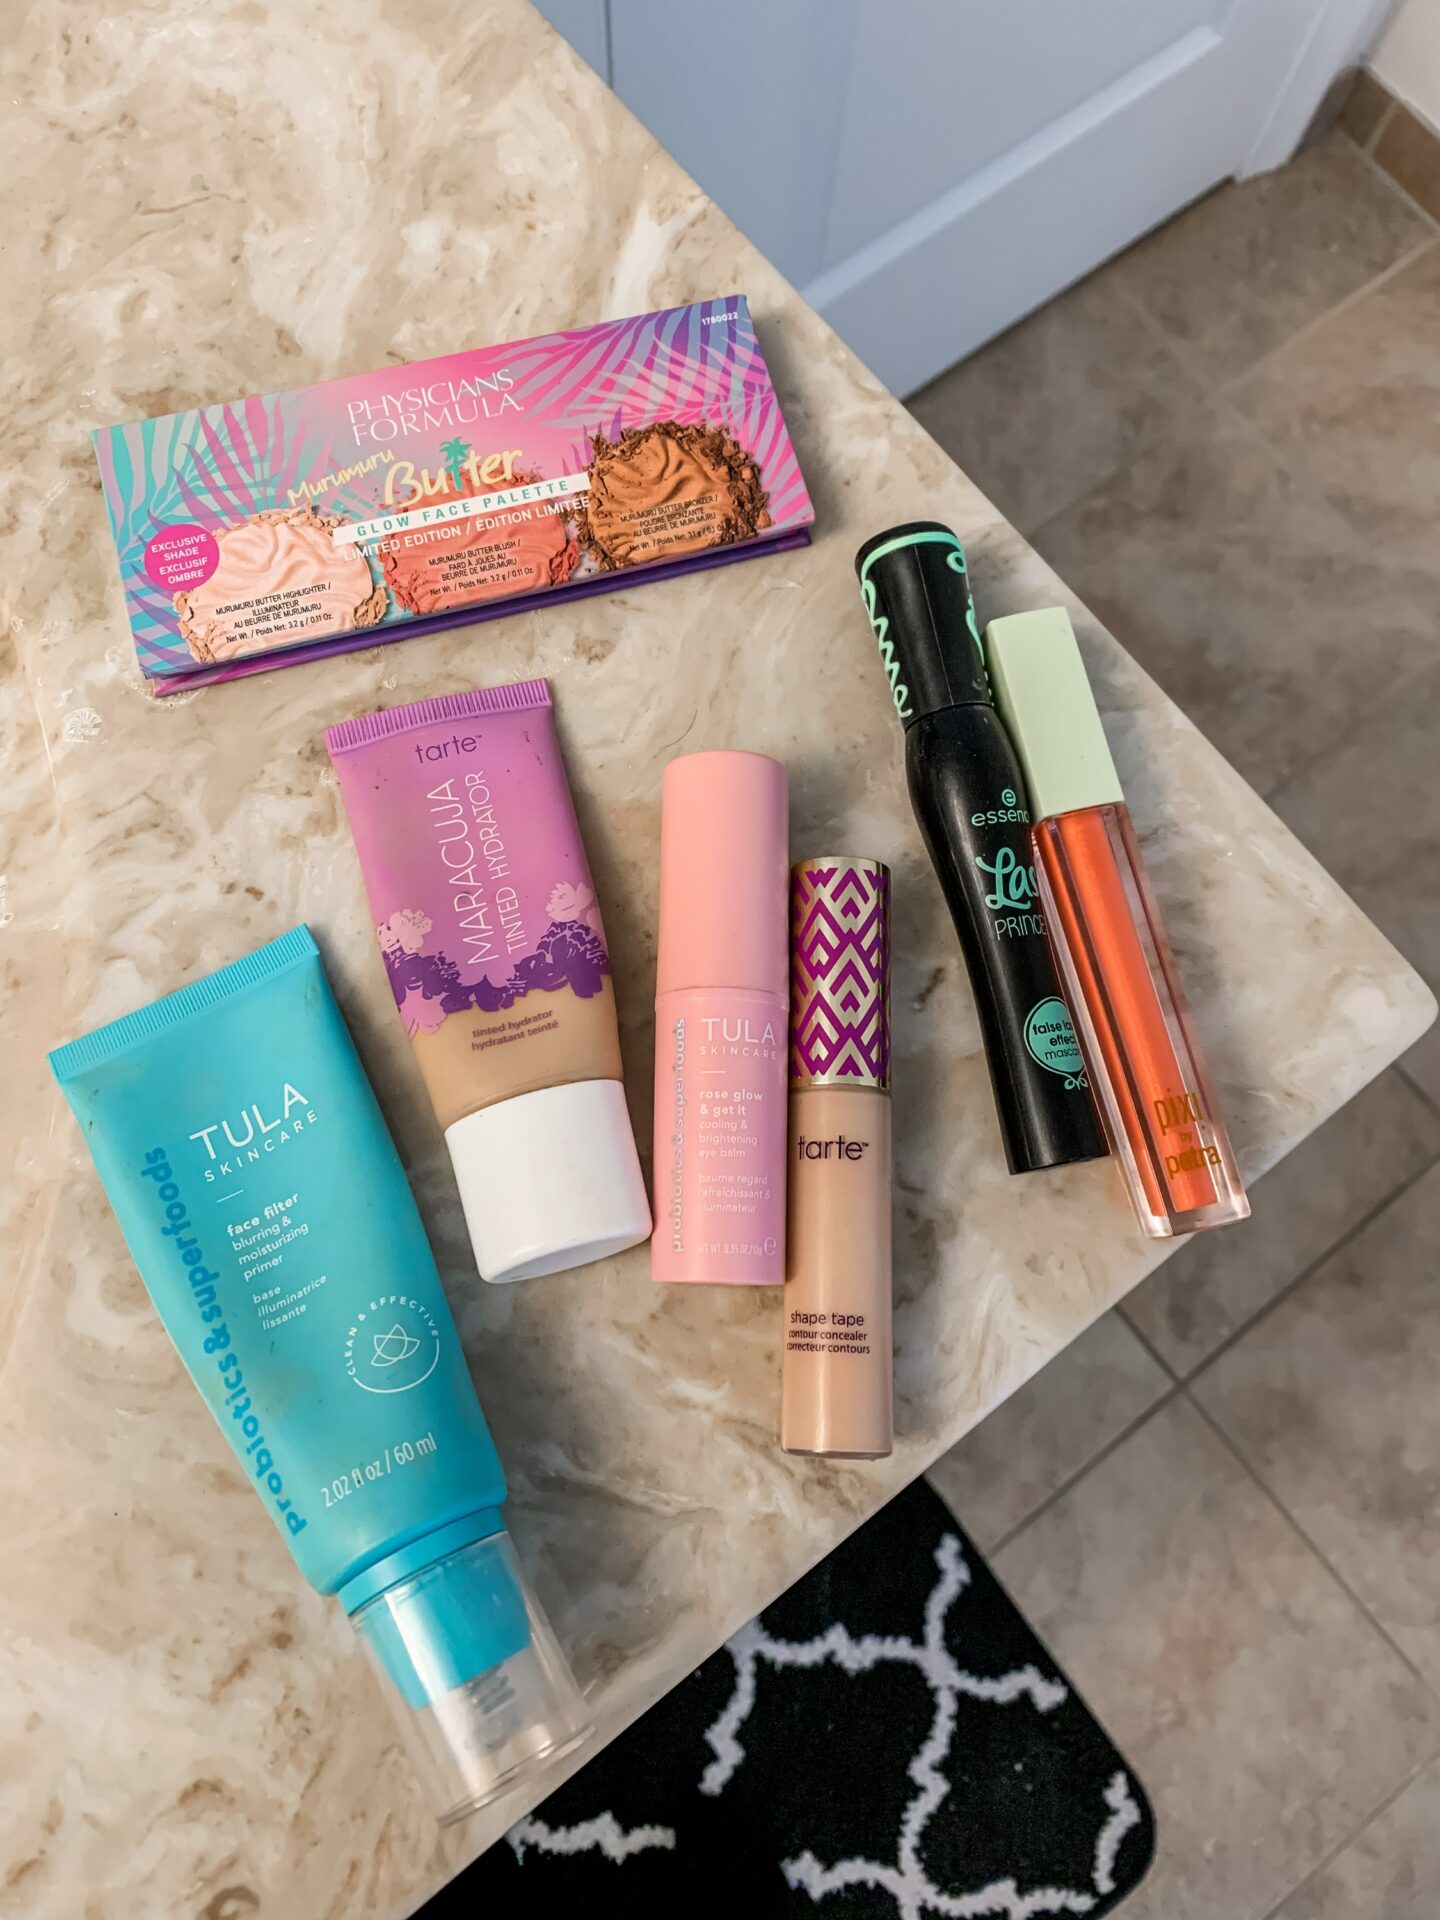 Everyday makeup - tarte shape tape, tula face filter